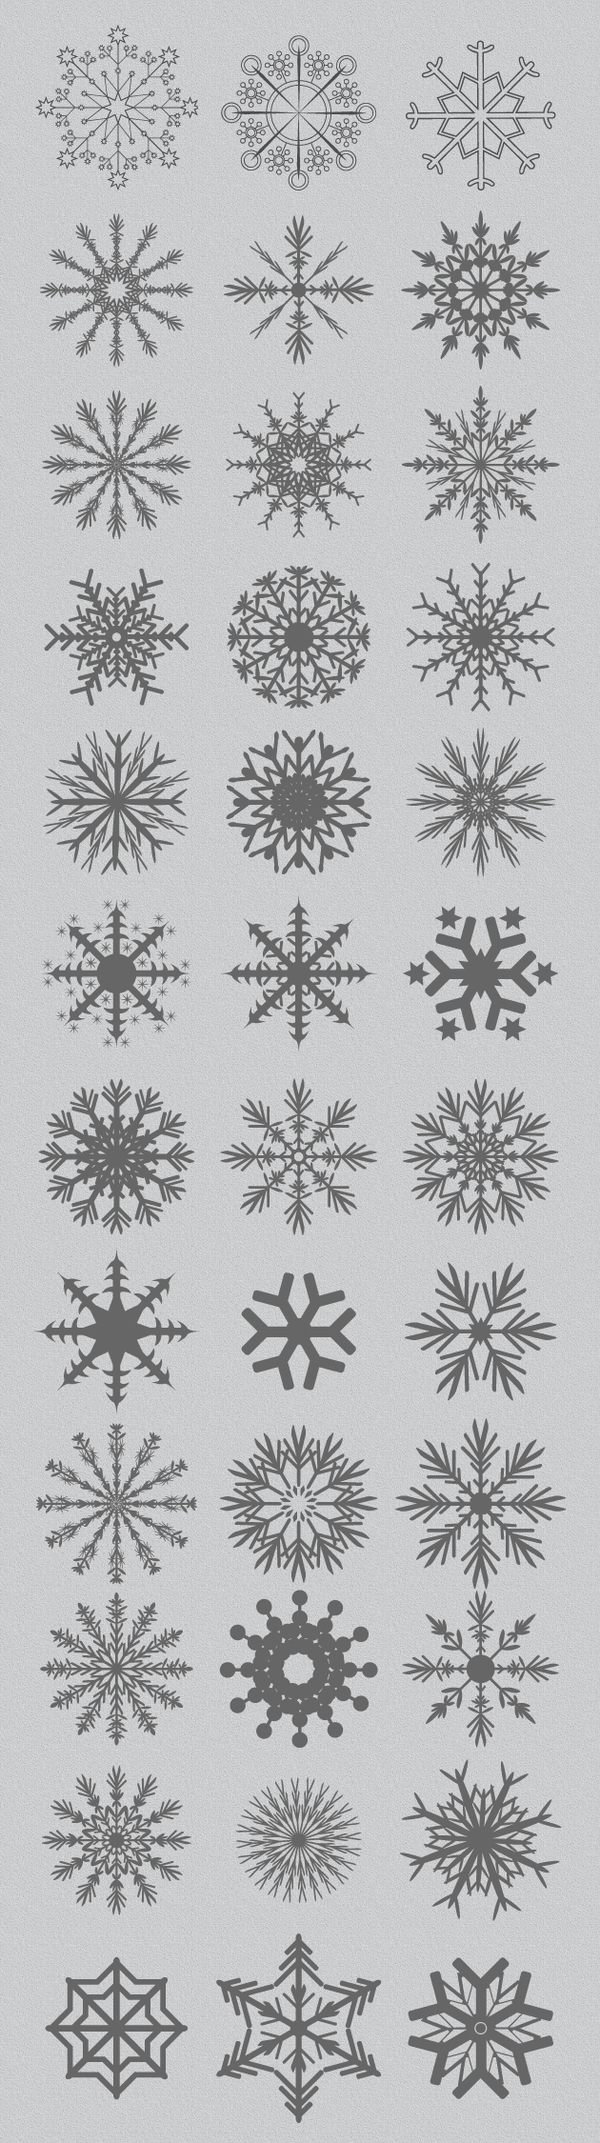 Snowflakes design vector set